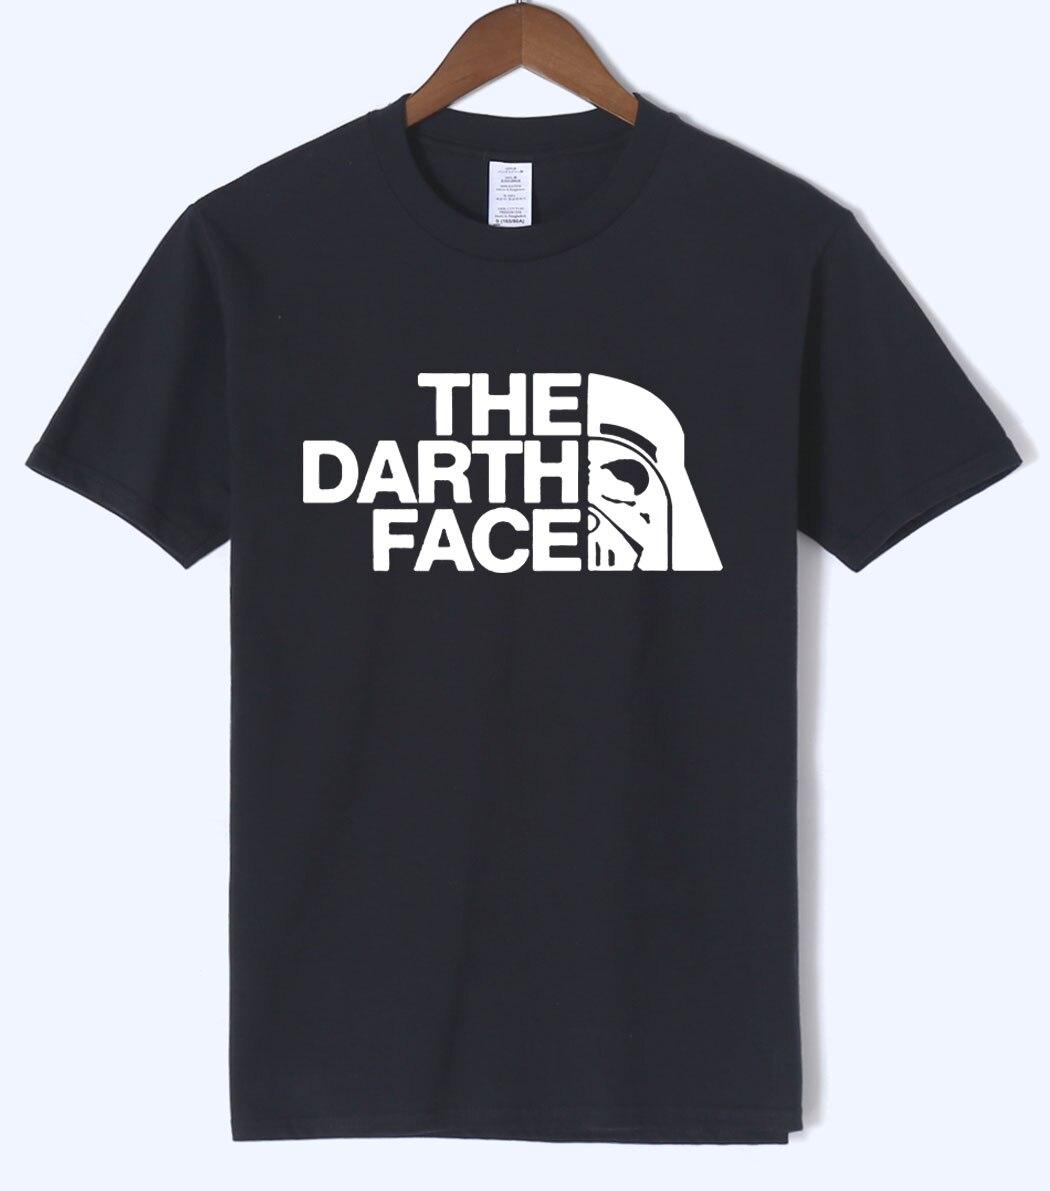 2018 DIE DARTH GESICHT muster männer T-shirts sommer kurzarm fitness T-shirt marke kleidung top tees undertale t hemd männer heißer